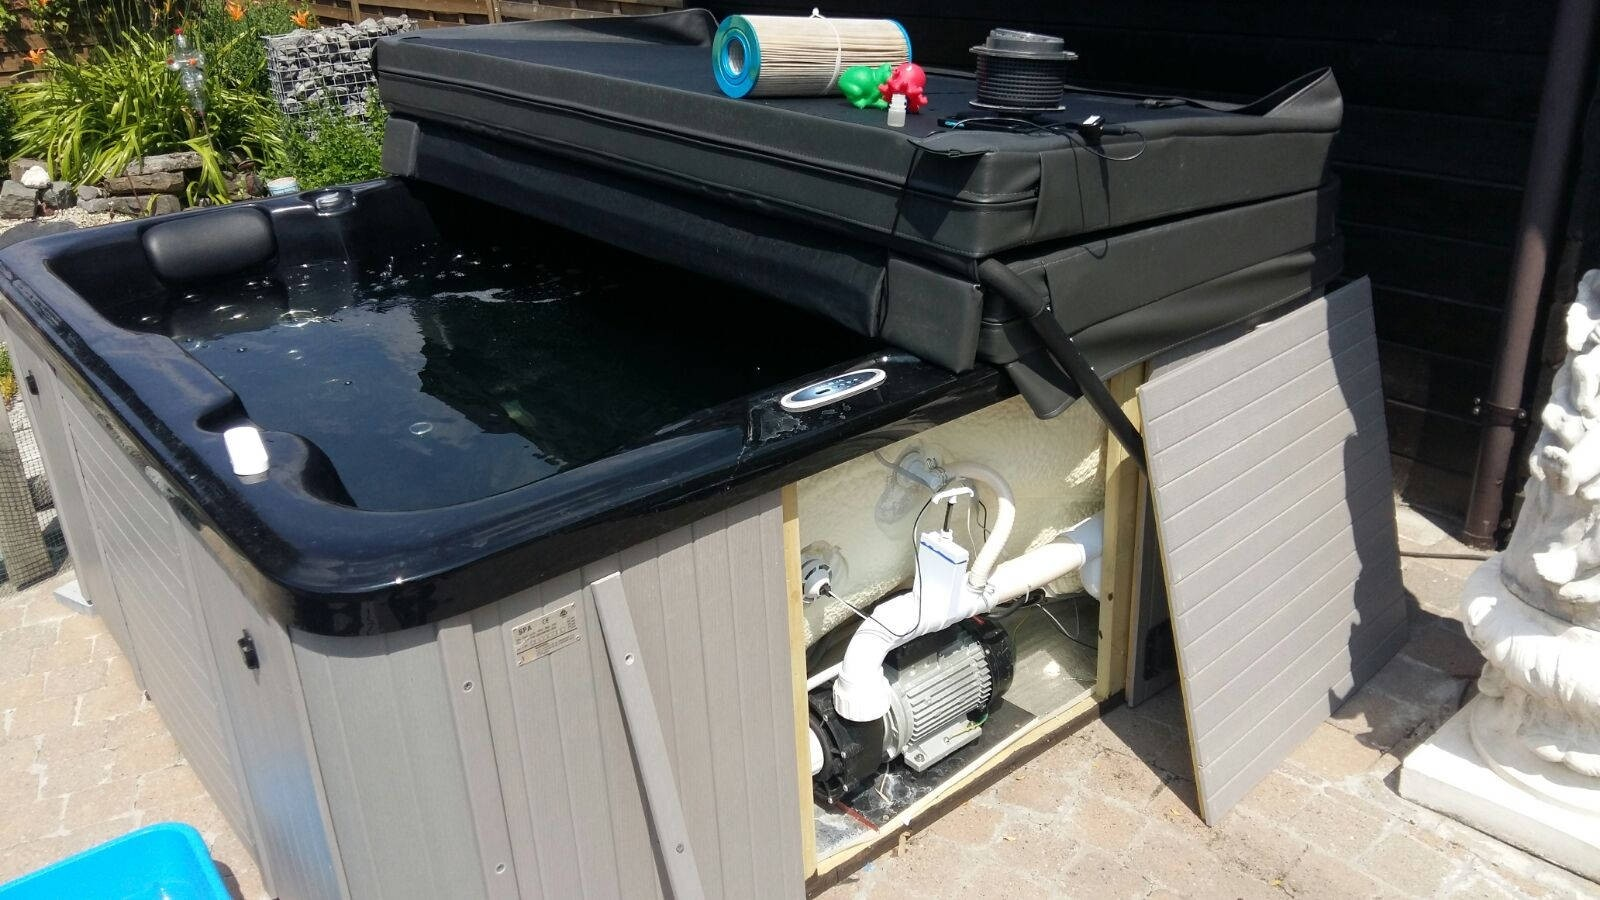 Reparatie en uitleg waterbehandeling Sunspa